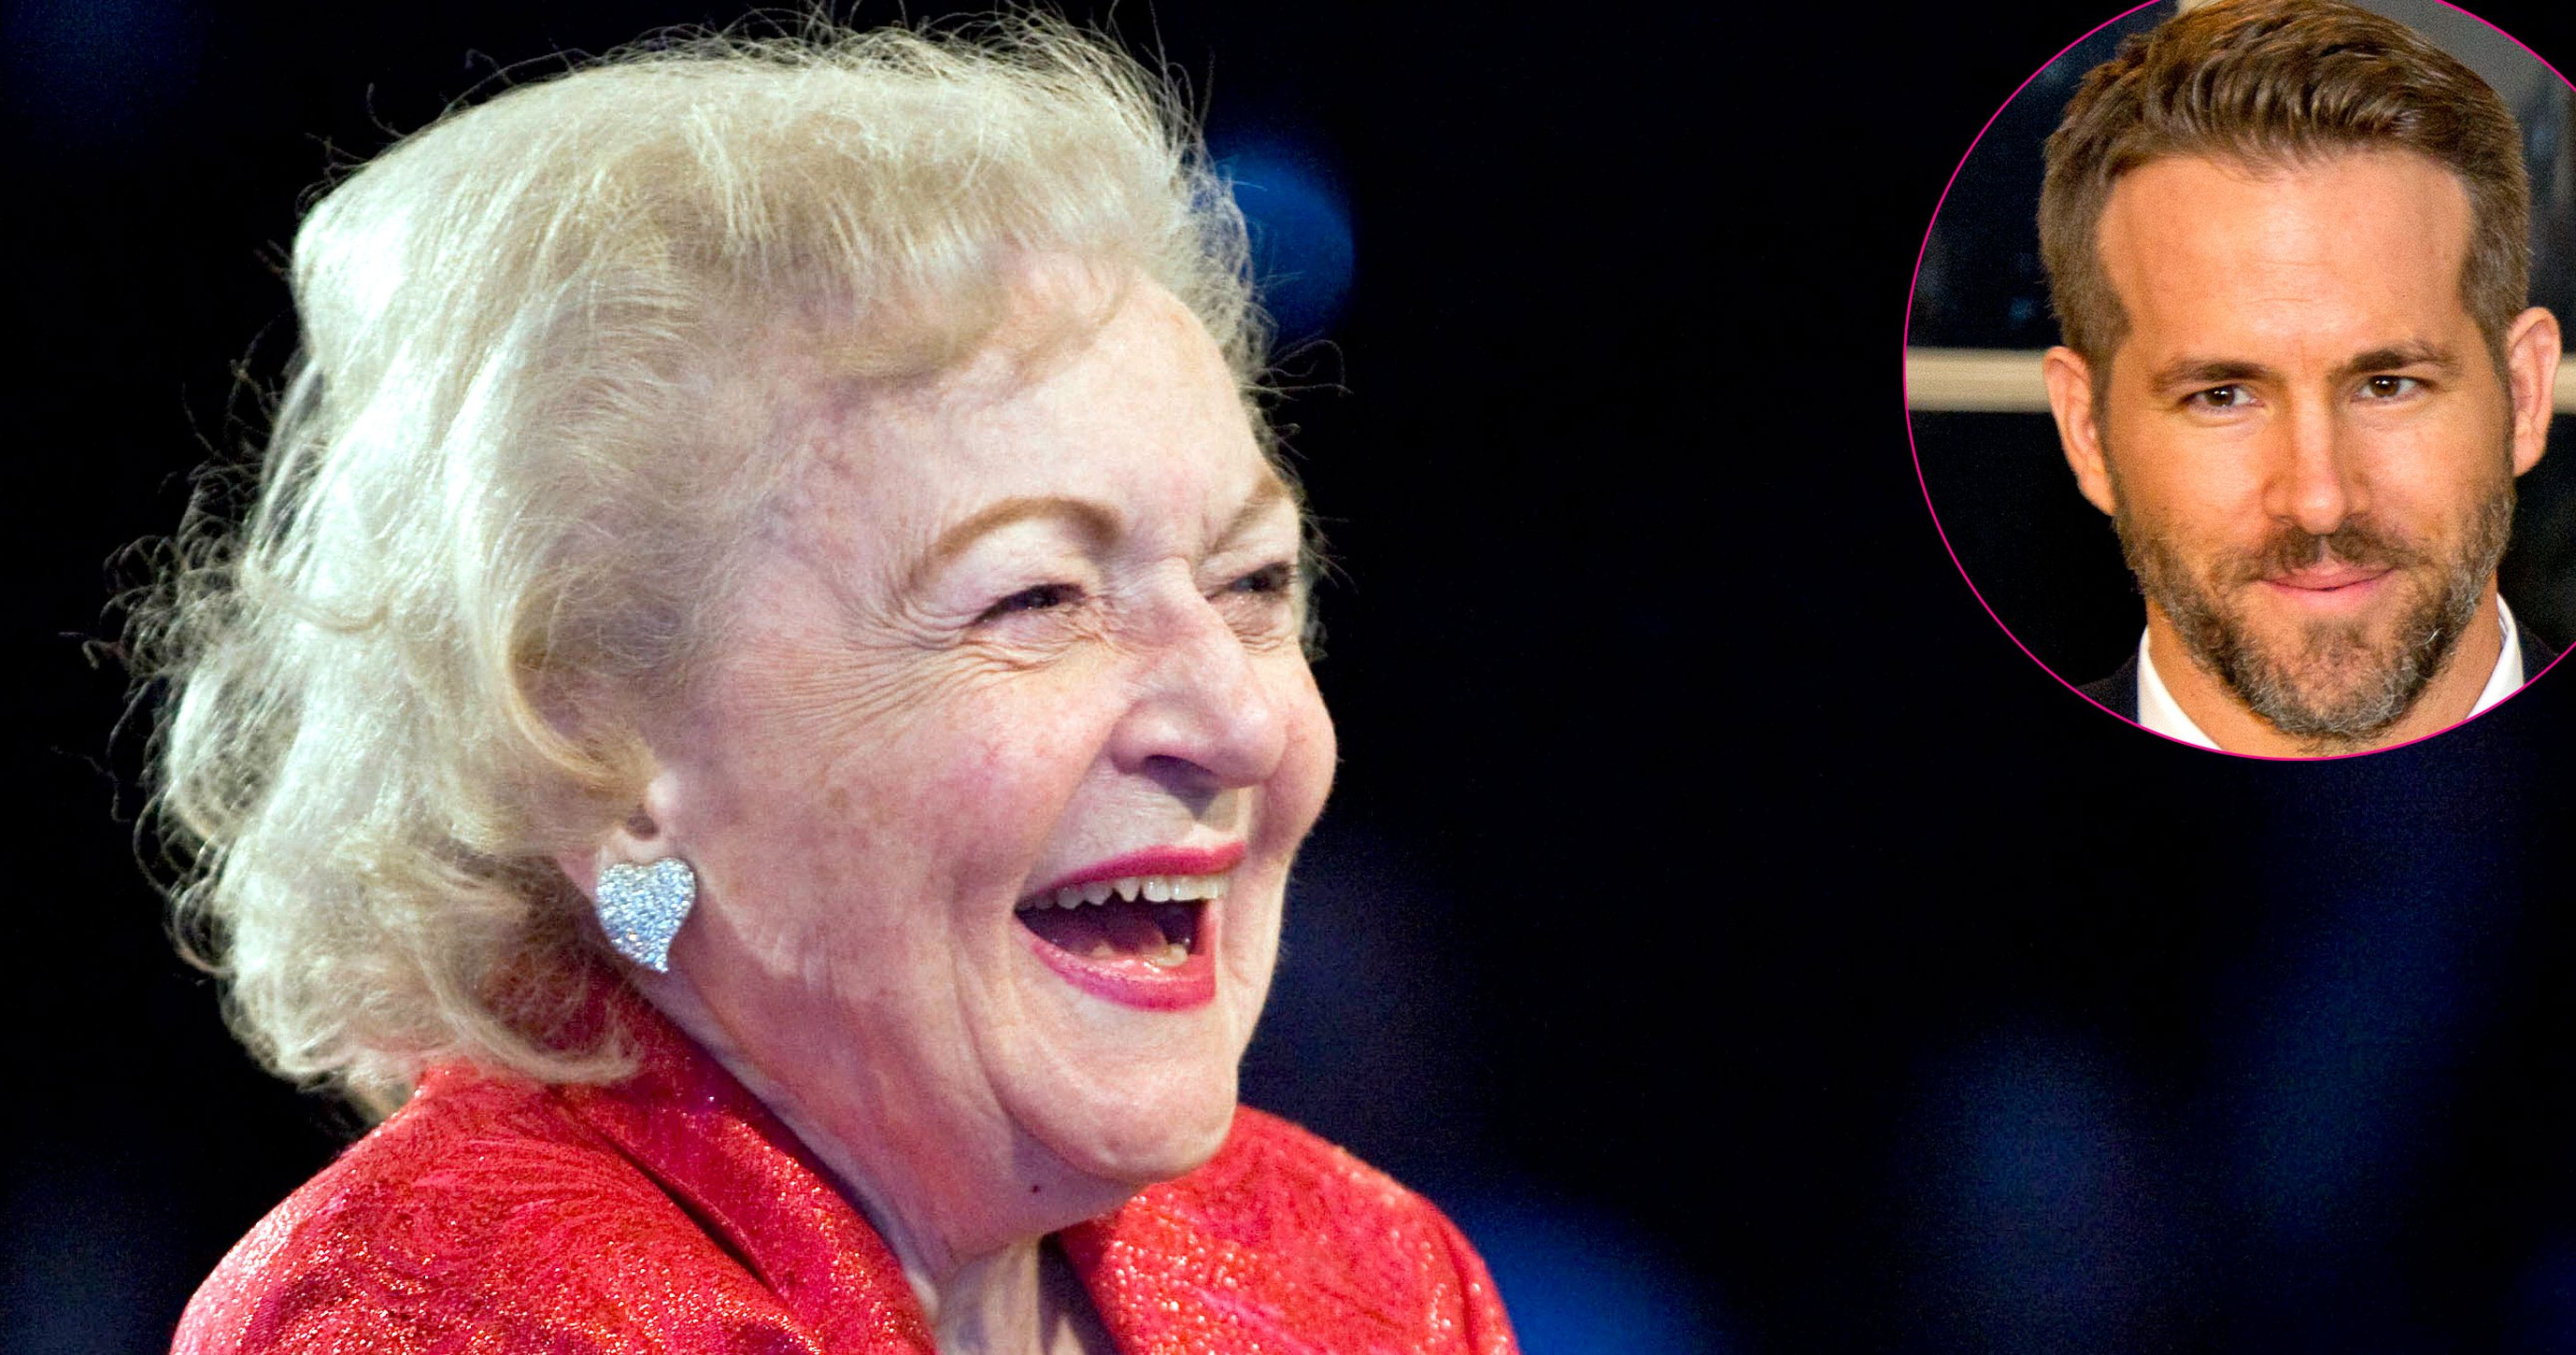 Ryan Reynolds, Hoda Kotb and More Celebs Wish Betty White Happy 97th Birthday